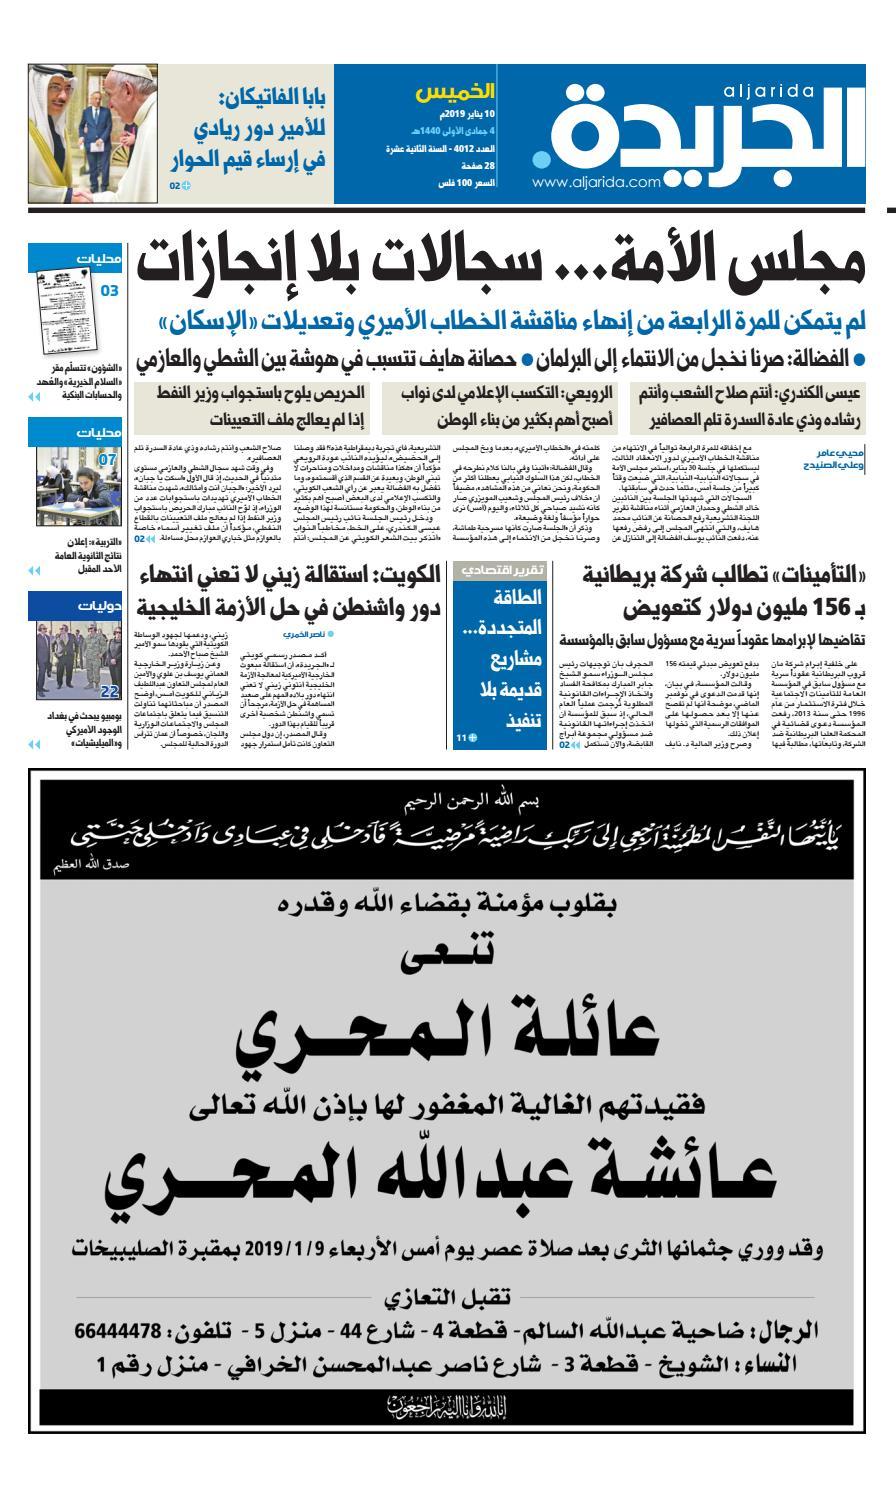 78575f3292d2b عدد الجريدة الخميس 10 يناير 2019 by Aljarida Newspaper - issuu